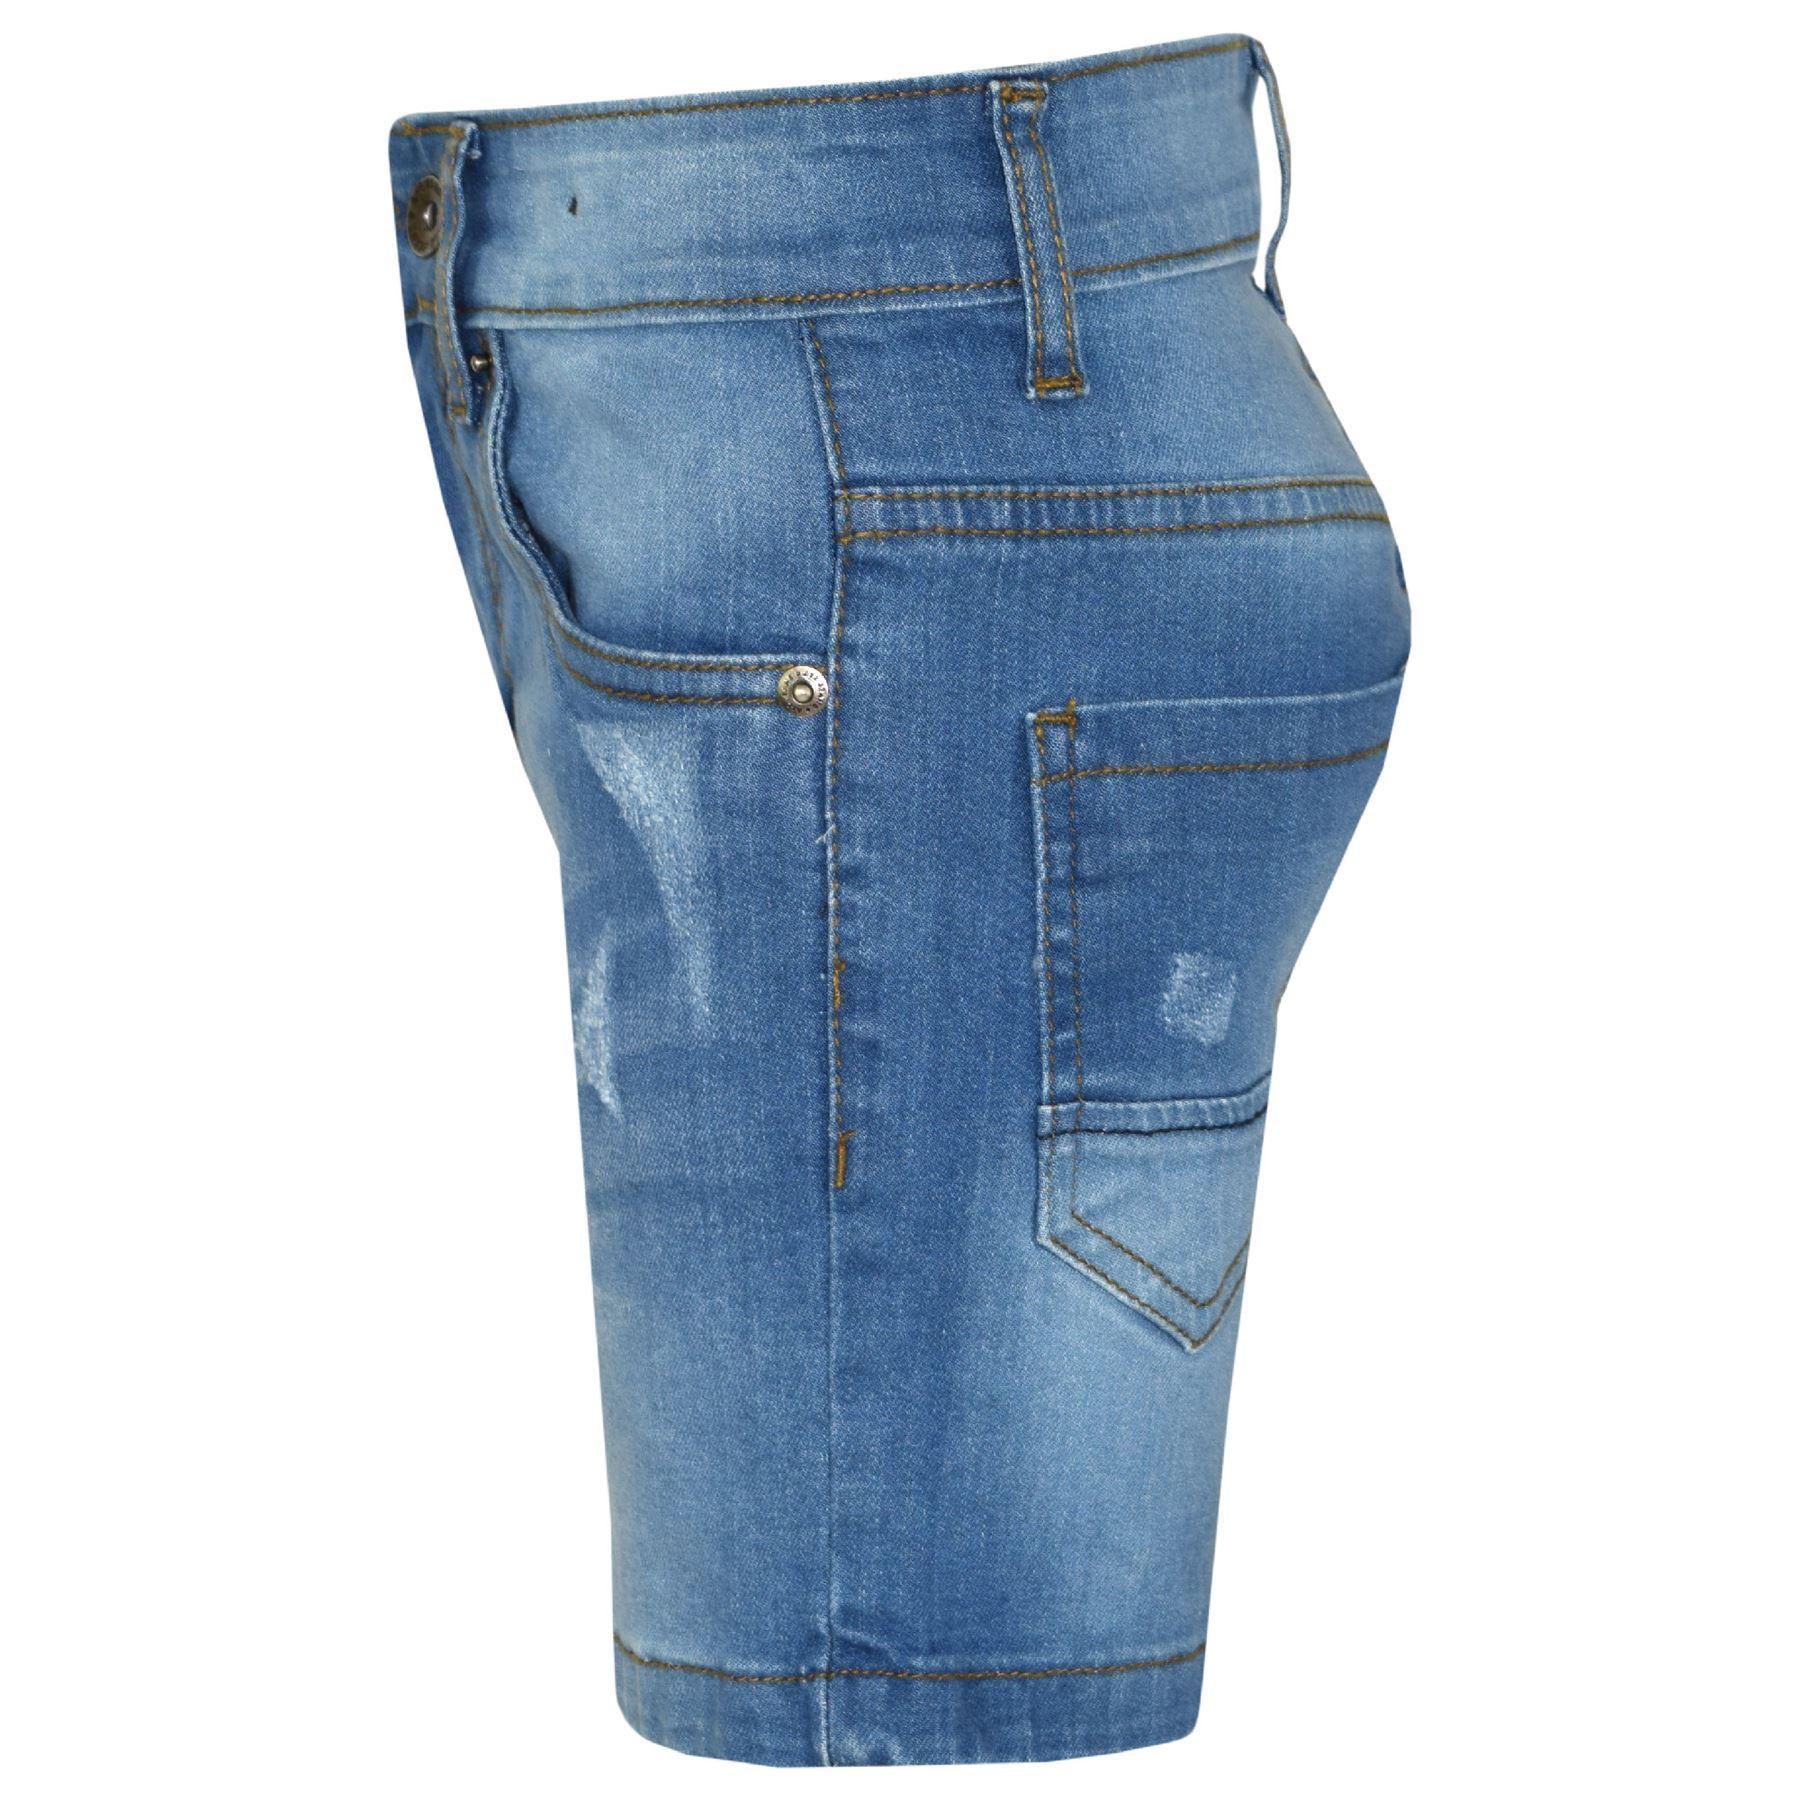 Kids Boys Denim Shorts Ripped Chino Bermuda Jeans Short Knee Length Pant 5-13 Yr